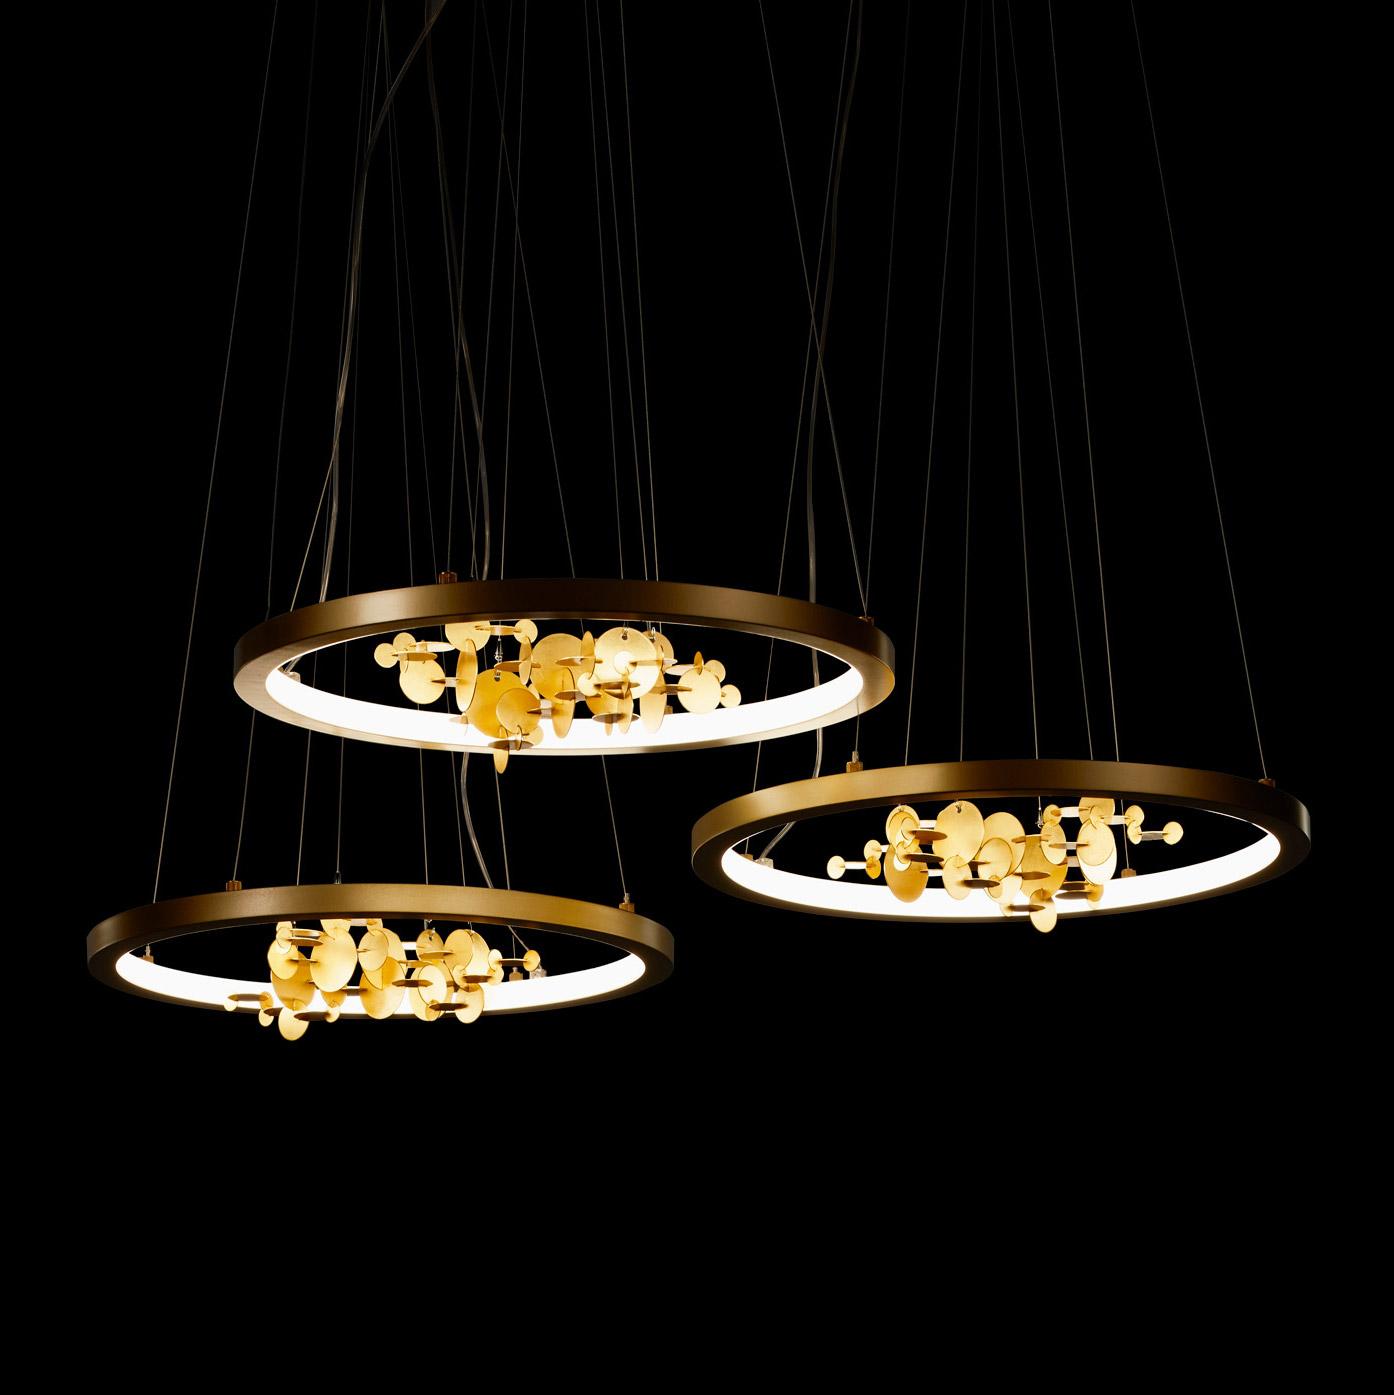 Five Lights Created By Japanese Designers Revealed At Designart Tokyo Showed